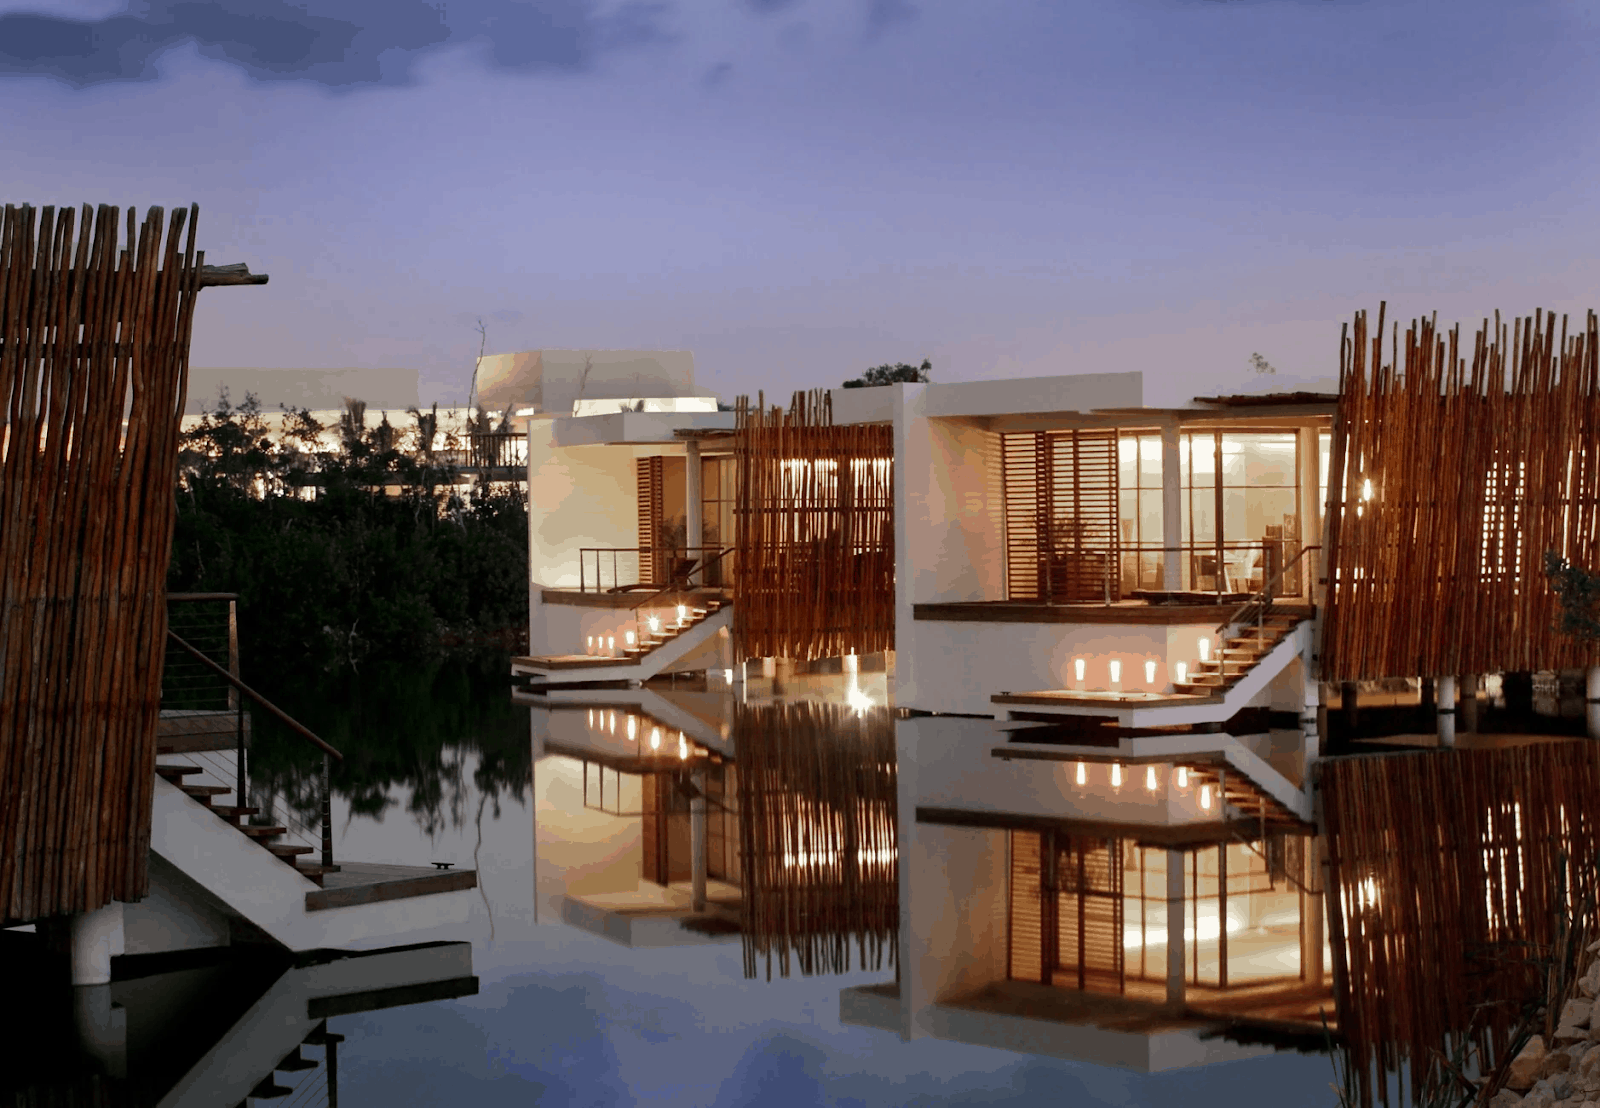 Hotel-Rosewood-Mayakoba-México-Playa-del-Carmen-